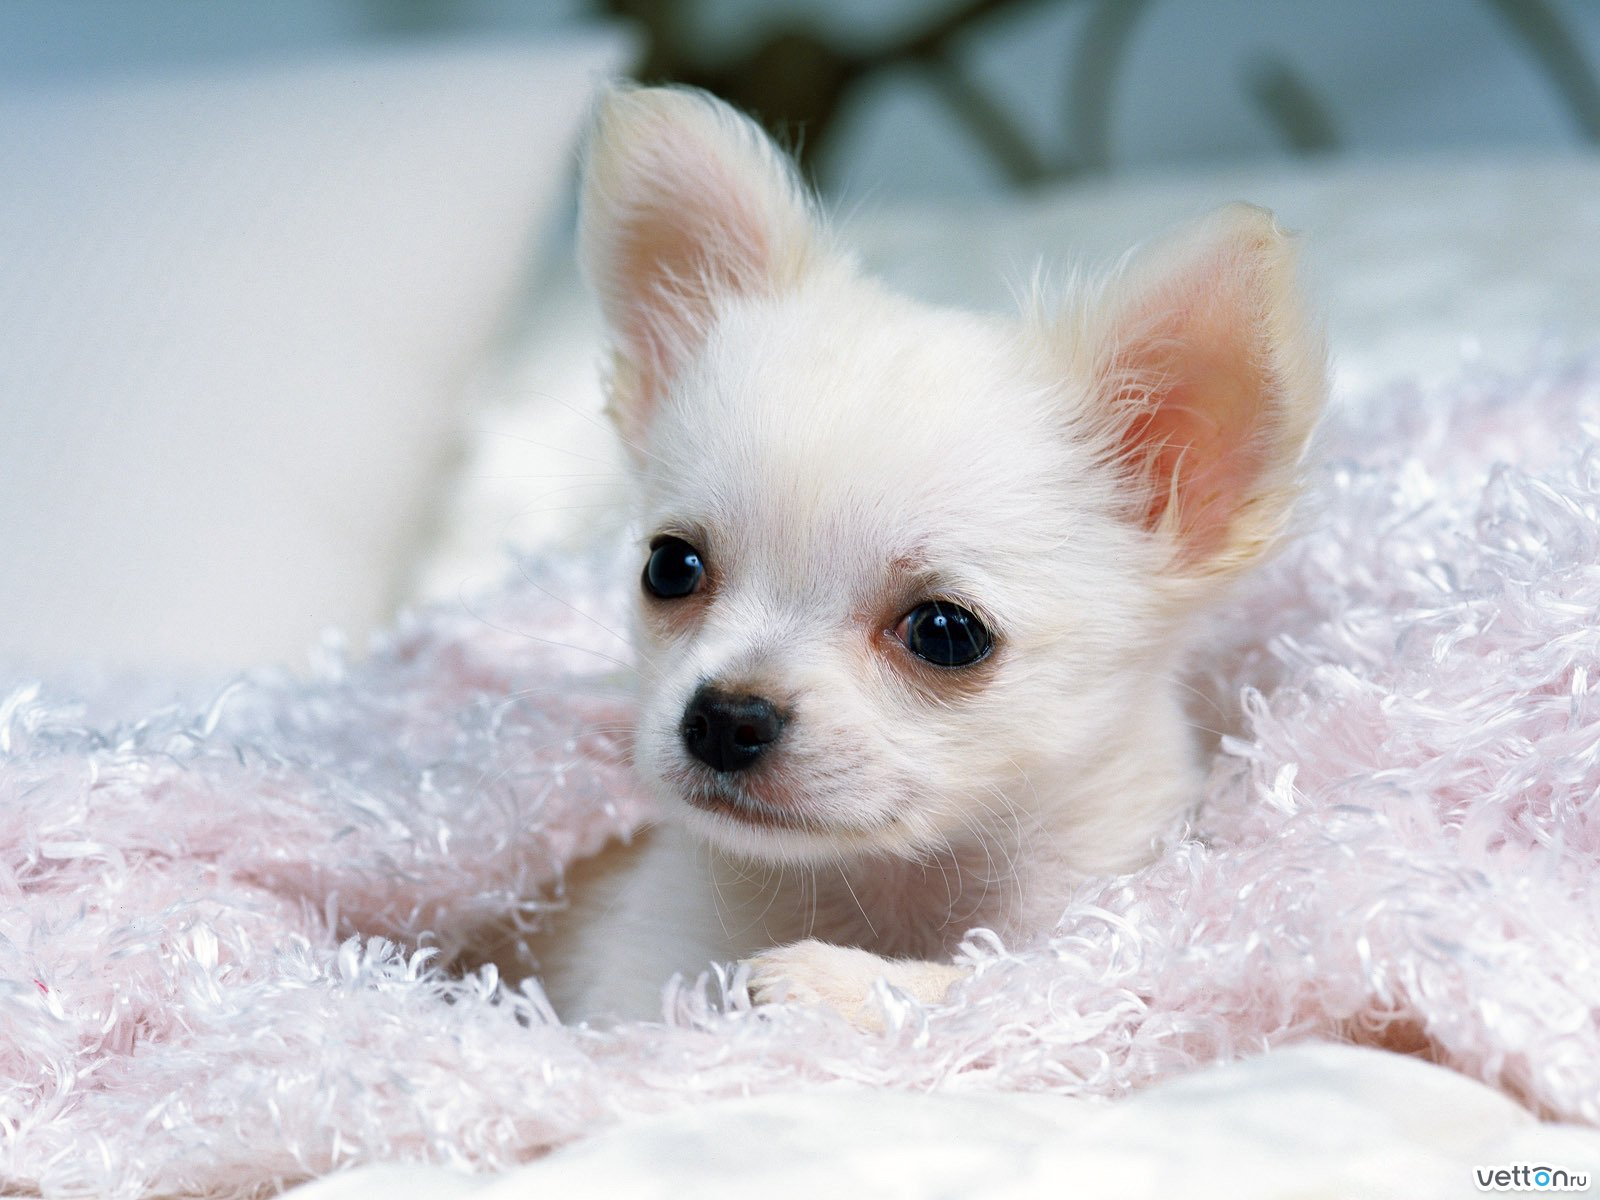 карманные собачки on We Heart It / visual bookmark #66608570. карманные собачки We Heart It.